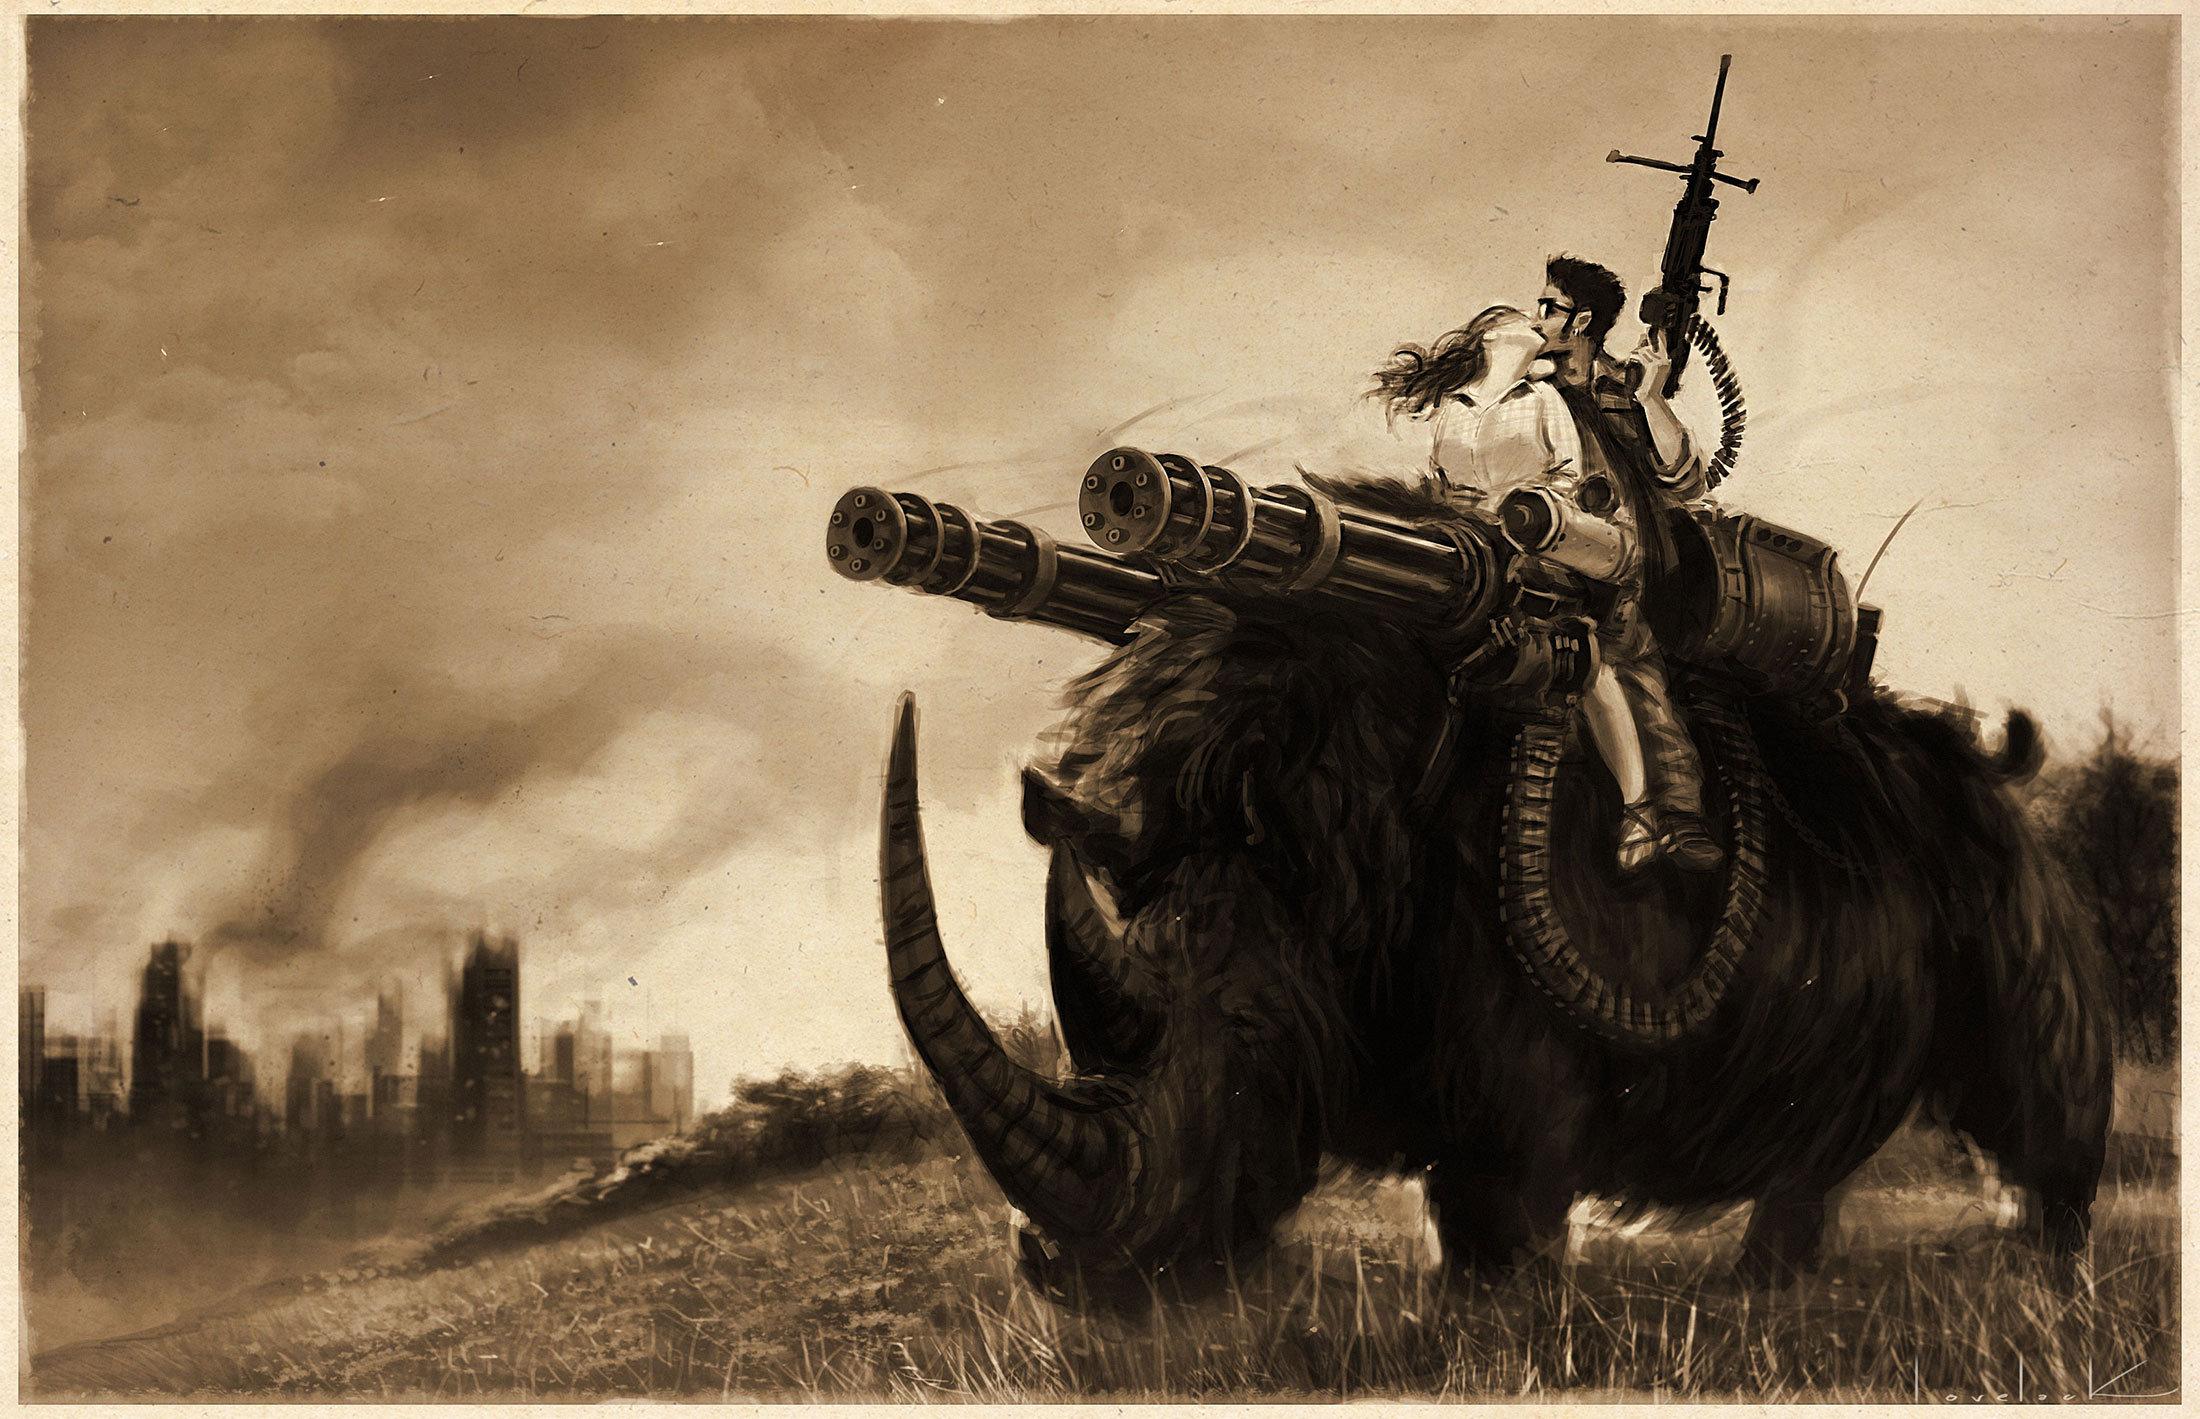 A Boy and his Rhino by RyanLovelock